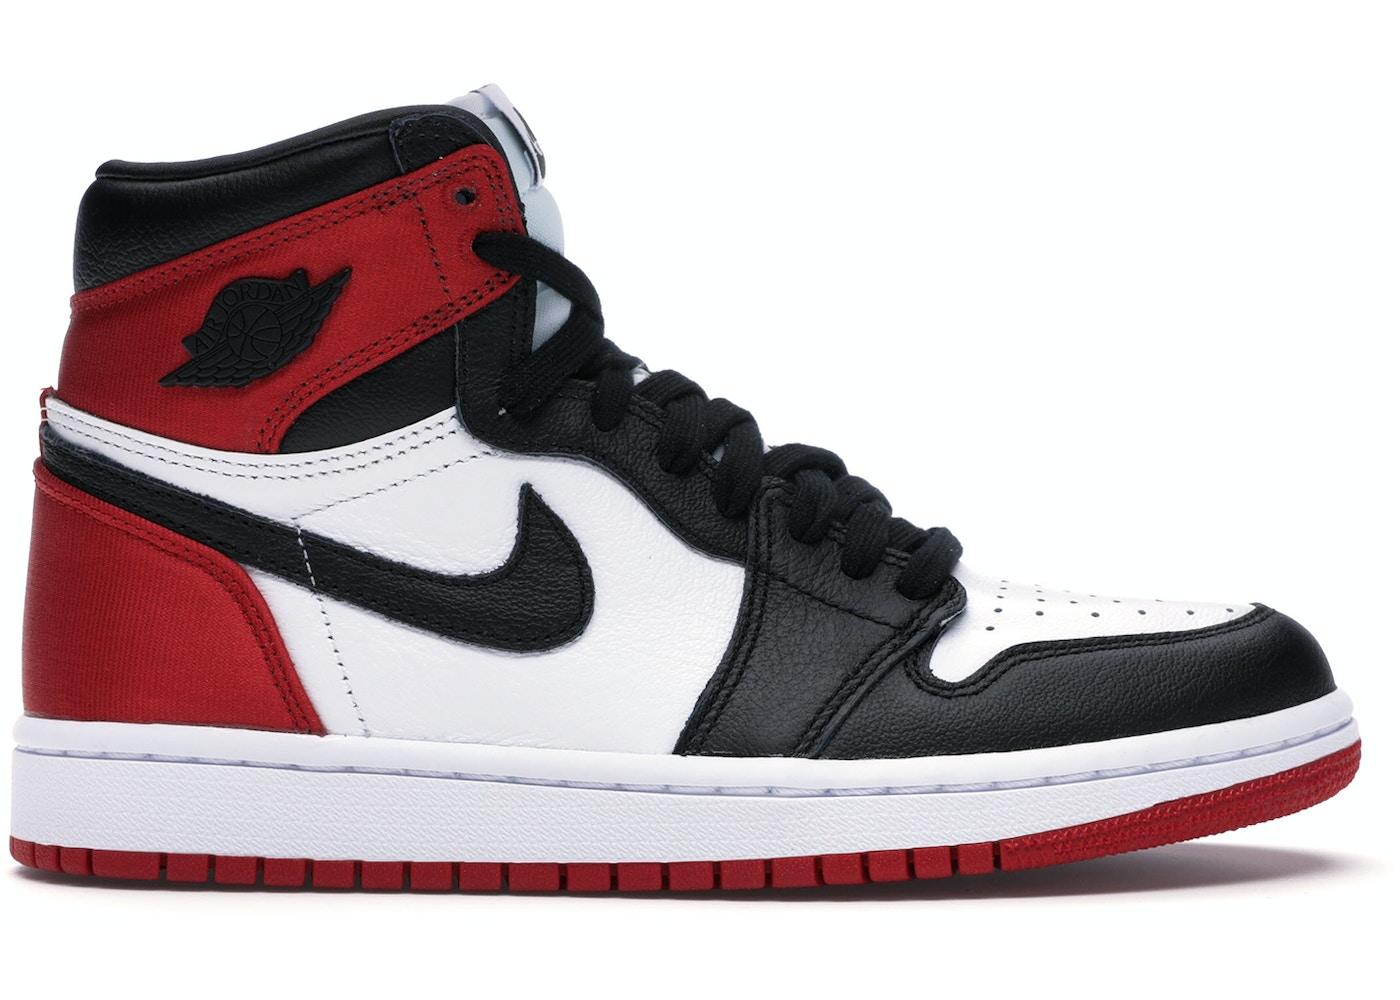 buy popular 8508f 59776 Buy Air Jordan Shoes & Deadstock Sneakers